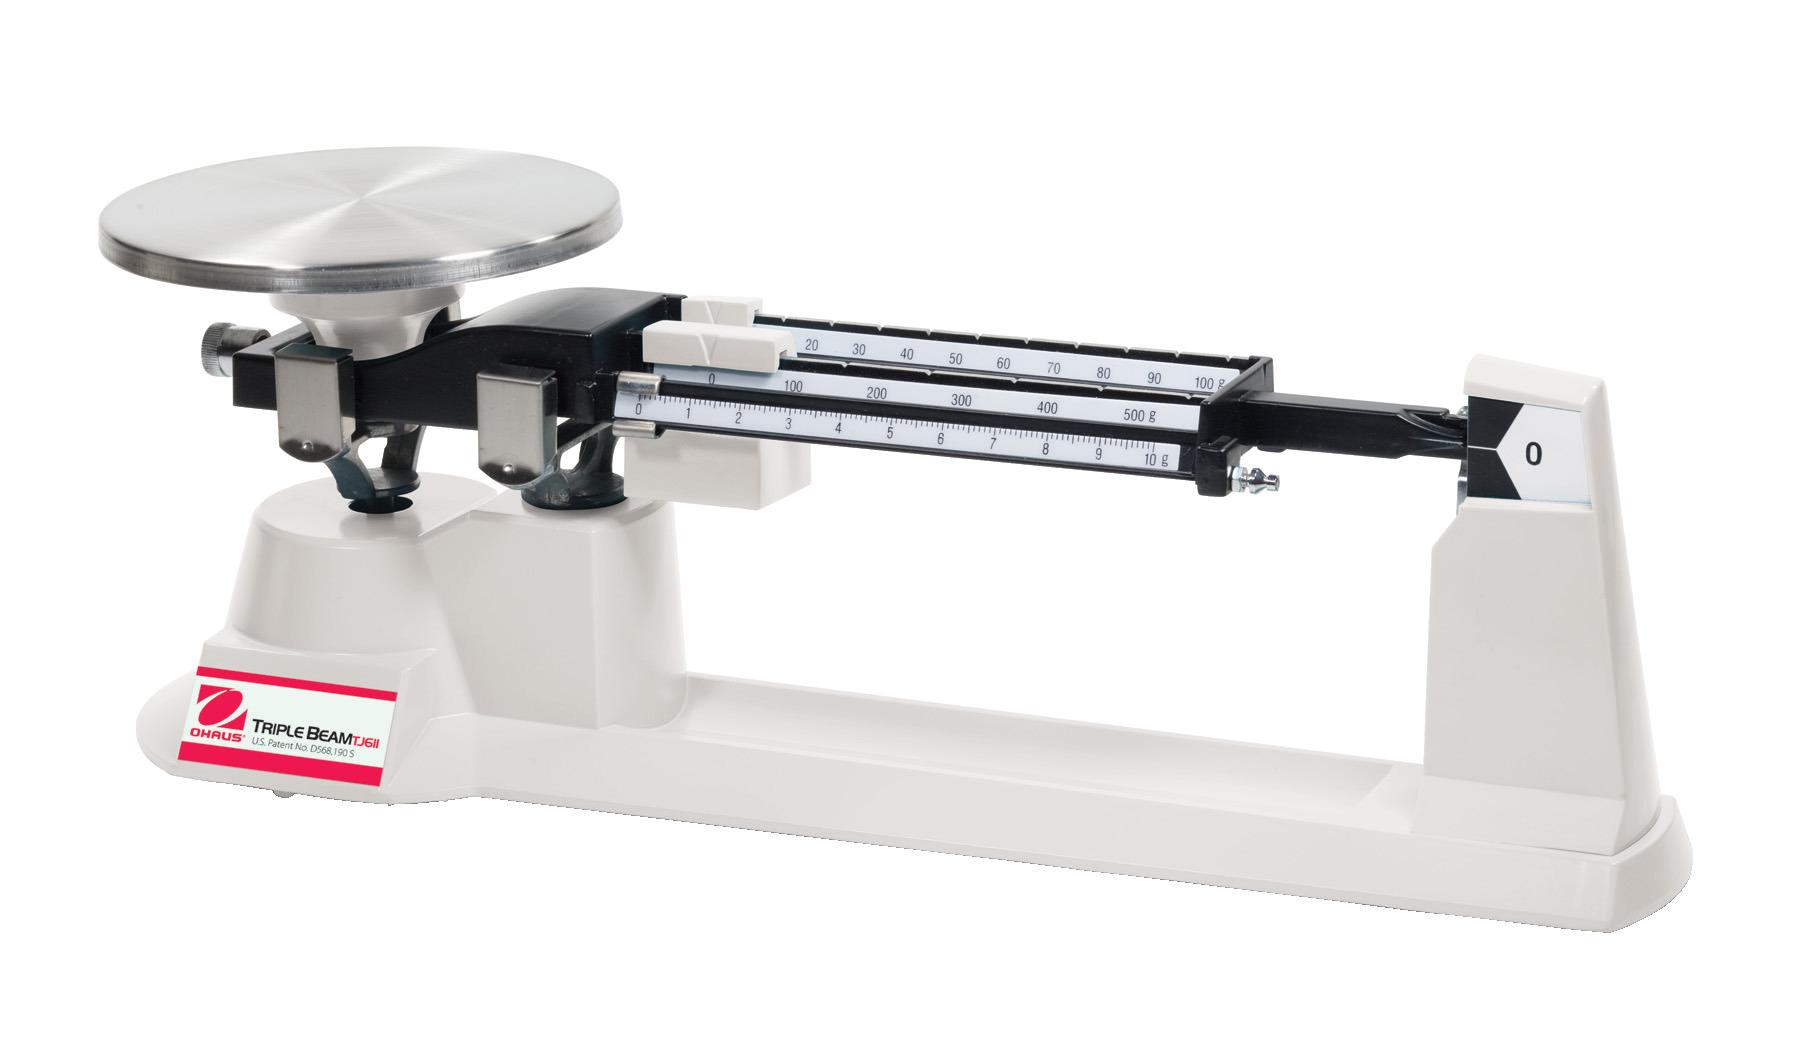 Triple Beam Balance - FREY SCIENTIFIC  for laboratory triple beam balance  150ifm